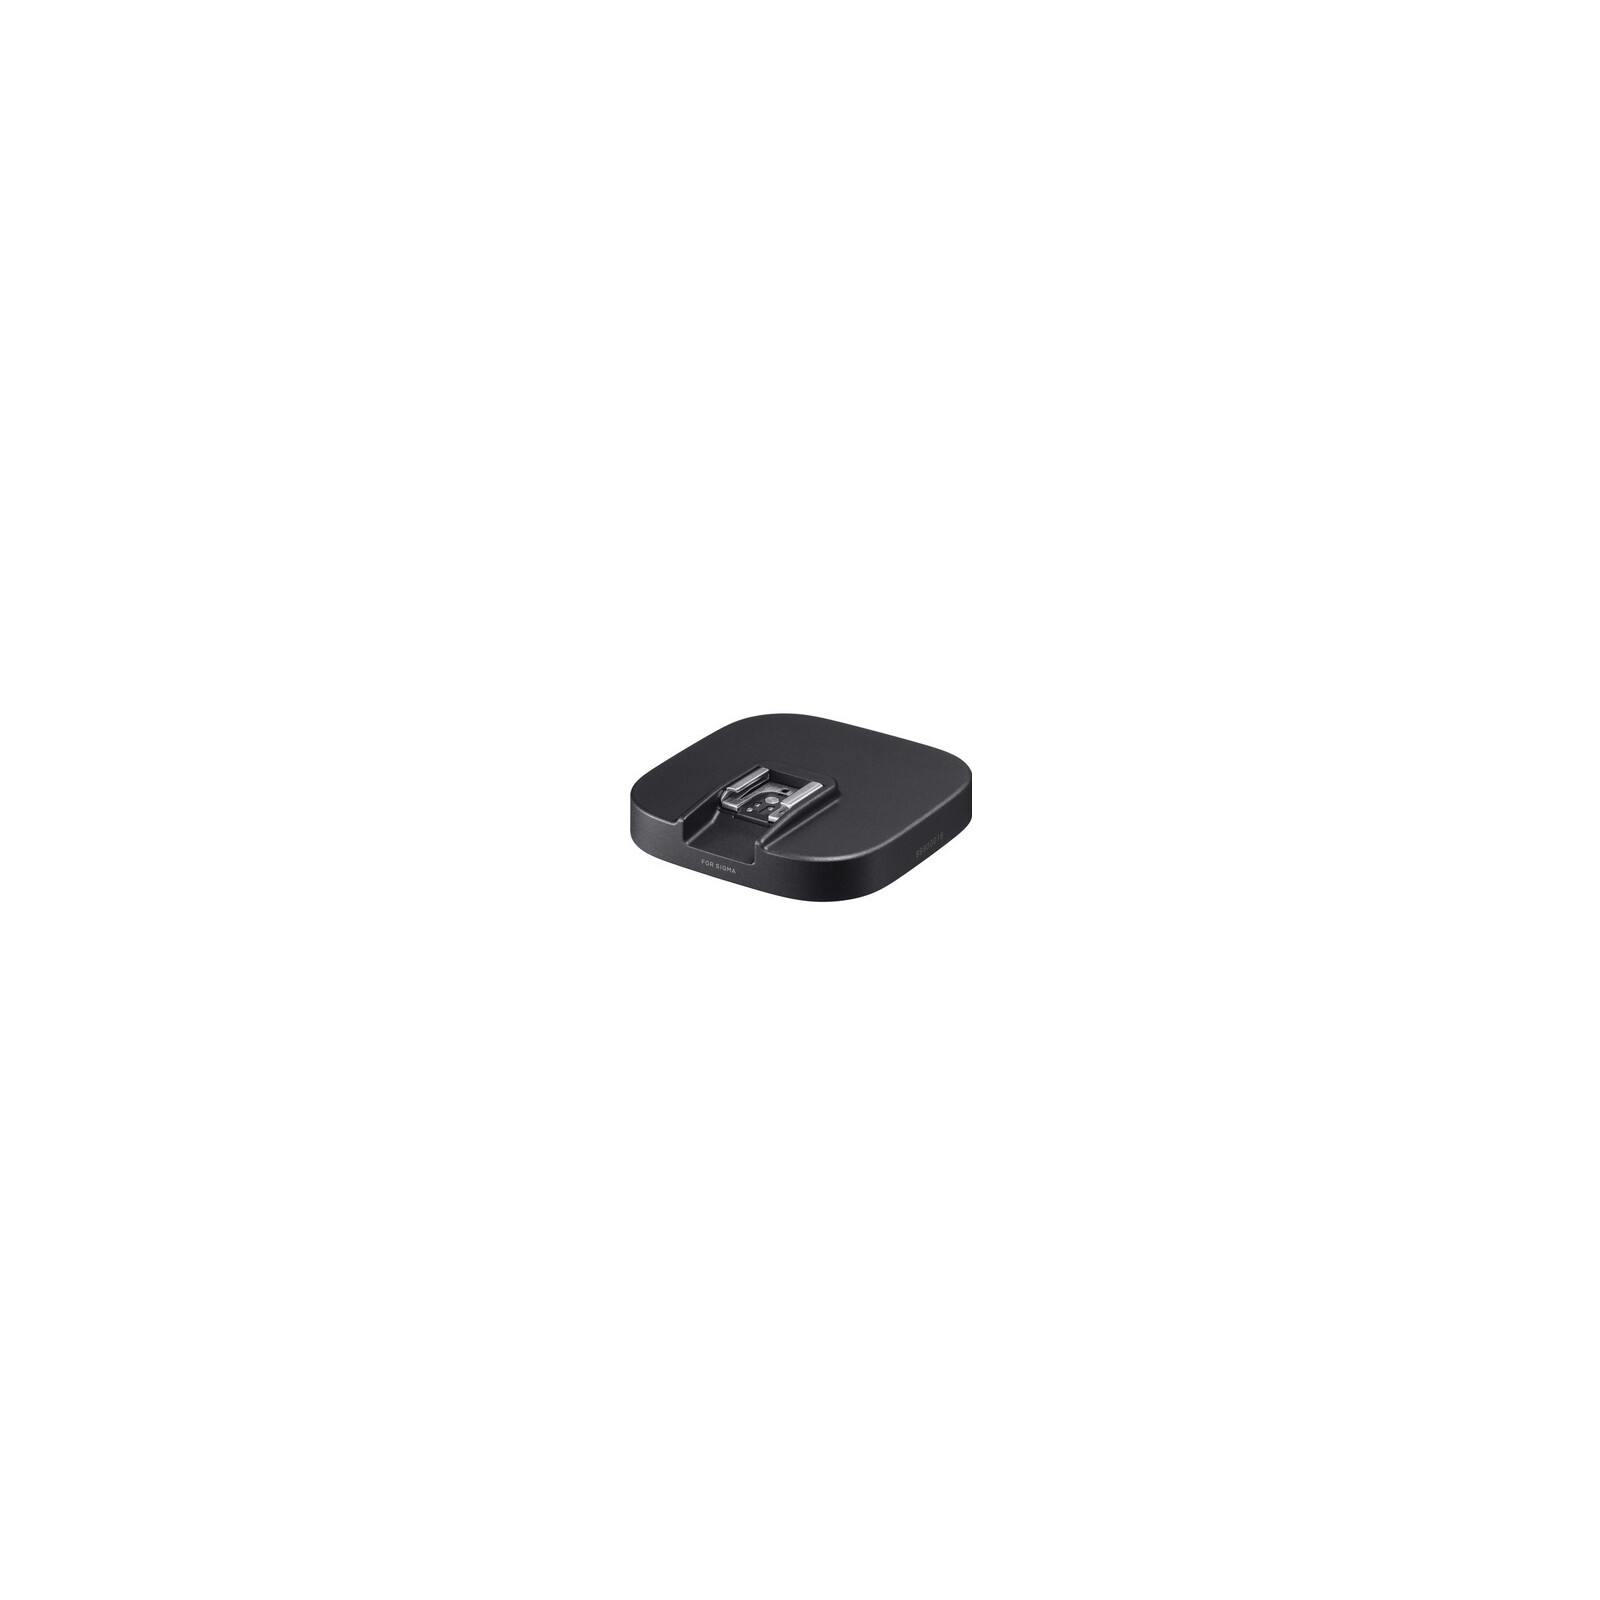 Sigma FD-11 Blitz USB Dock Sigma